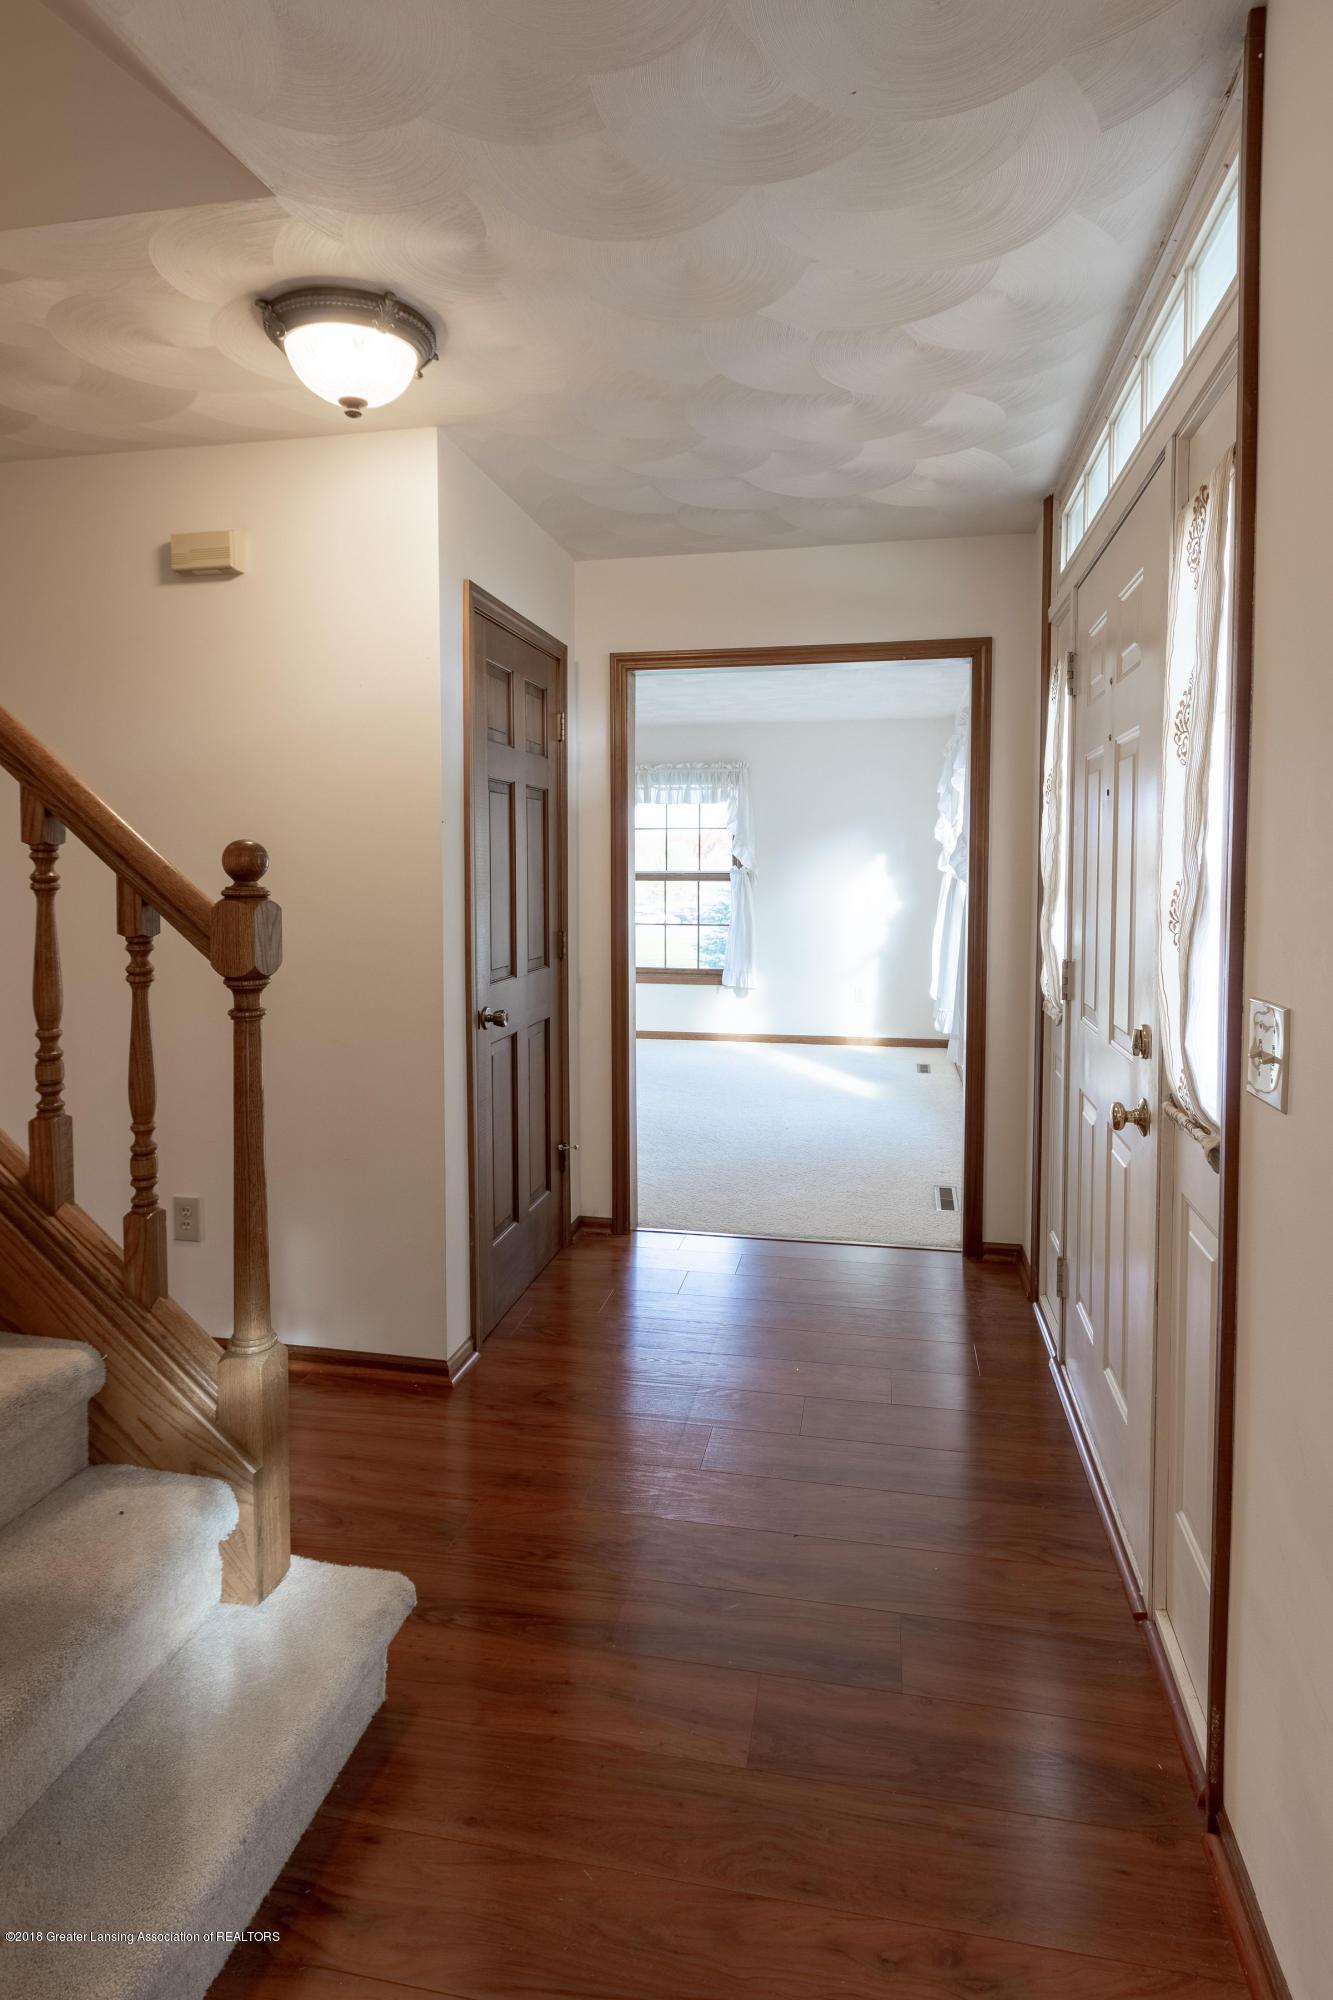 3981 Breckinridge Dr - Foyer - 9